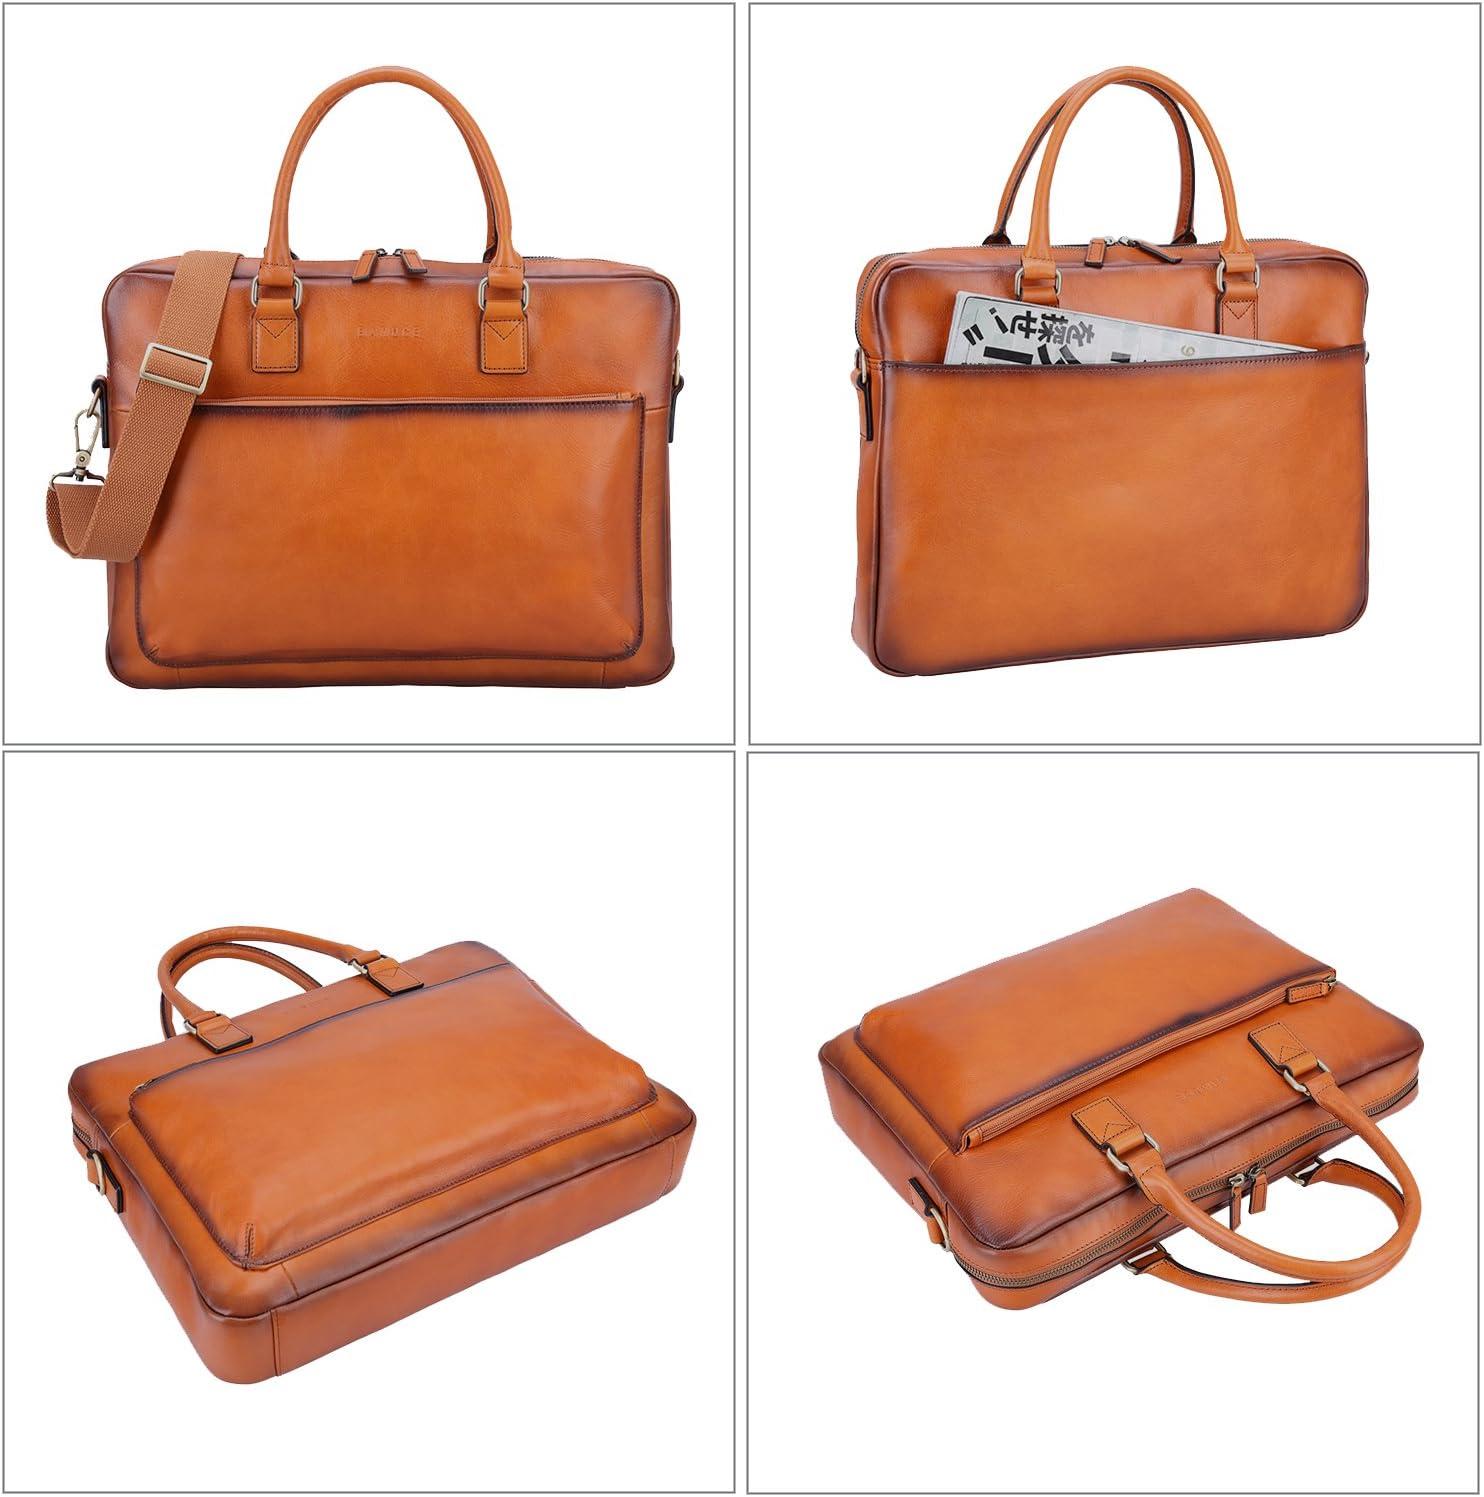 Banuce Full Grains Italian Leather Briefcase for Men Women Handbags Attache Case Business Tote Shoulder Messenger Bag